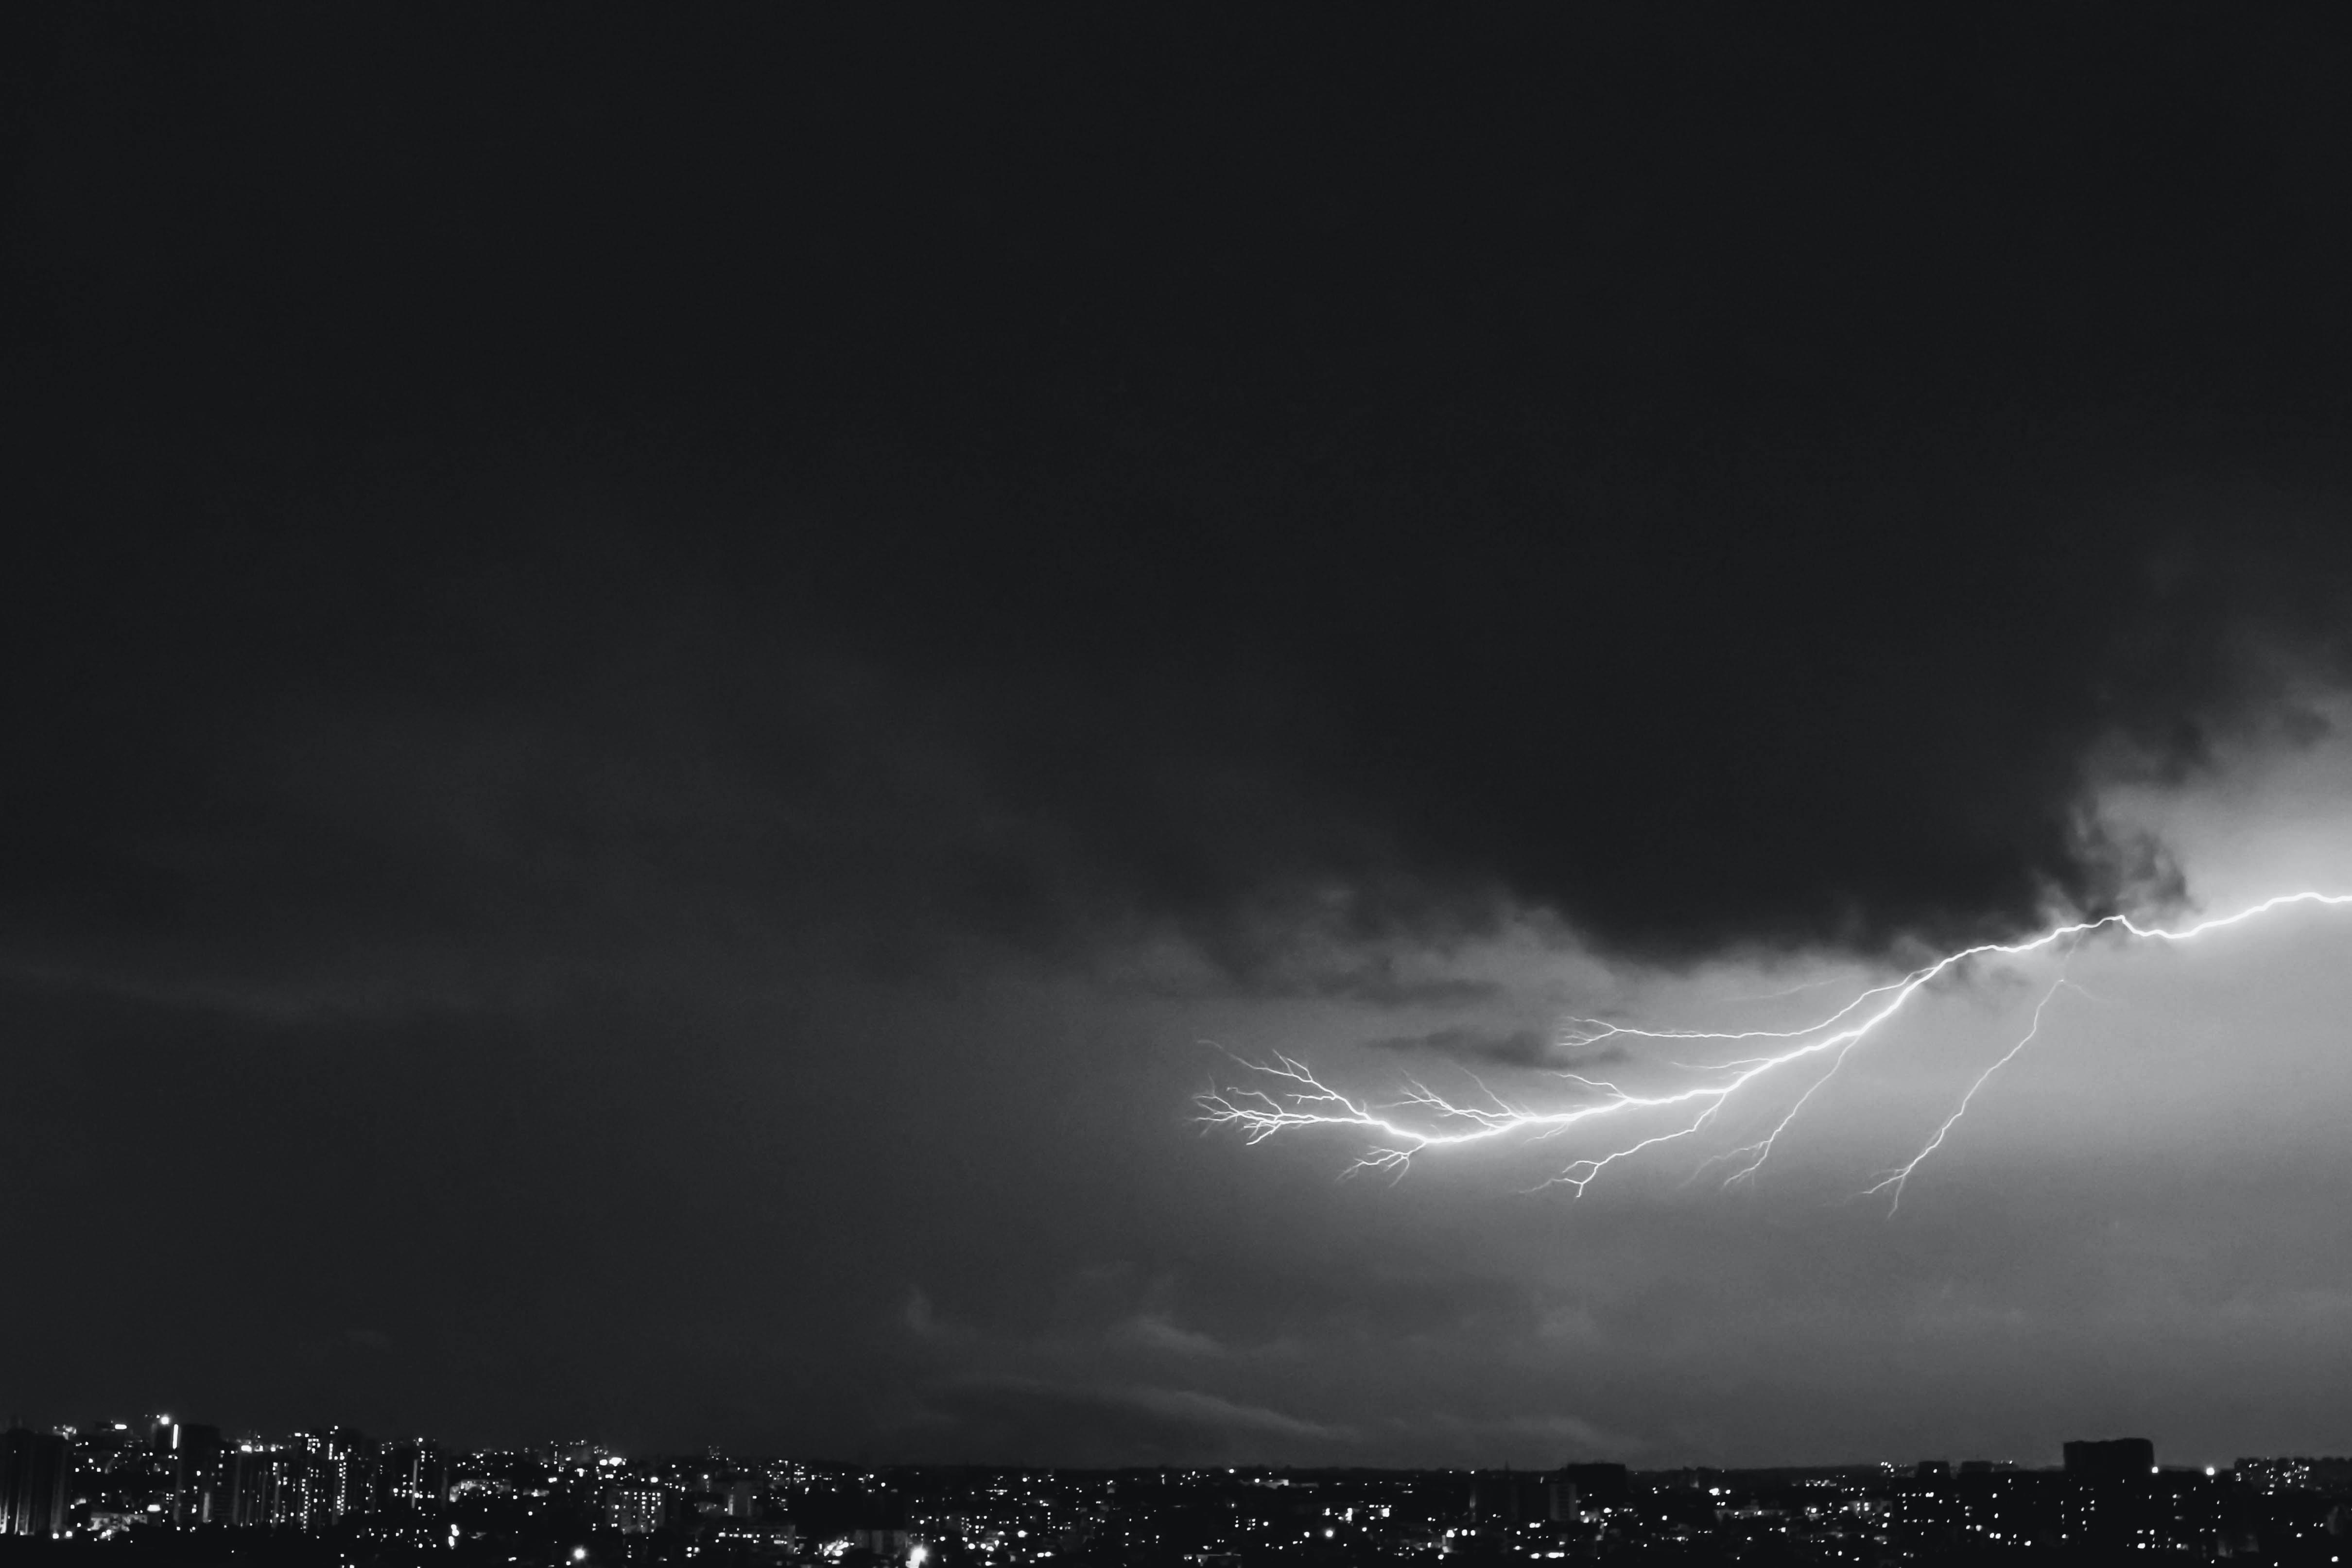 A long lightning bolt creeping across the night sky over a city